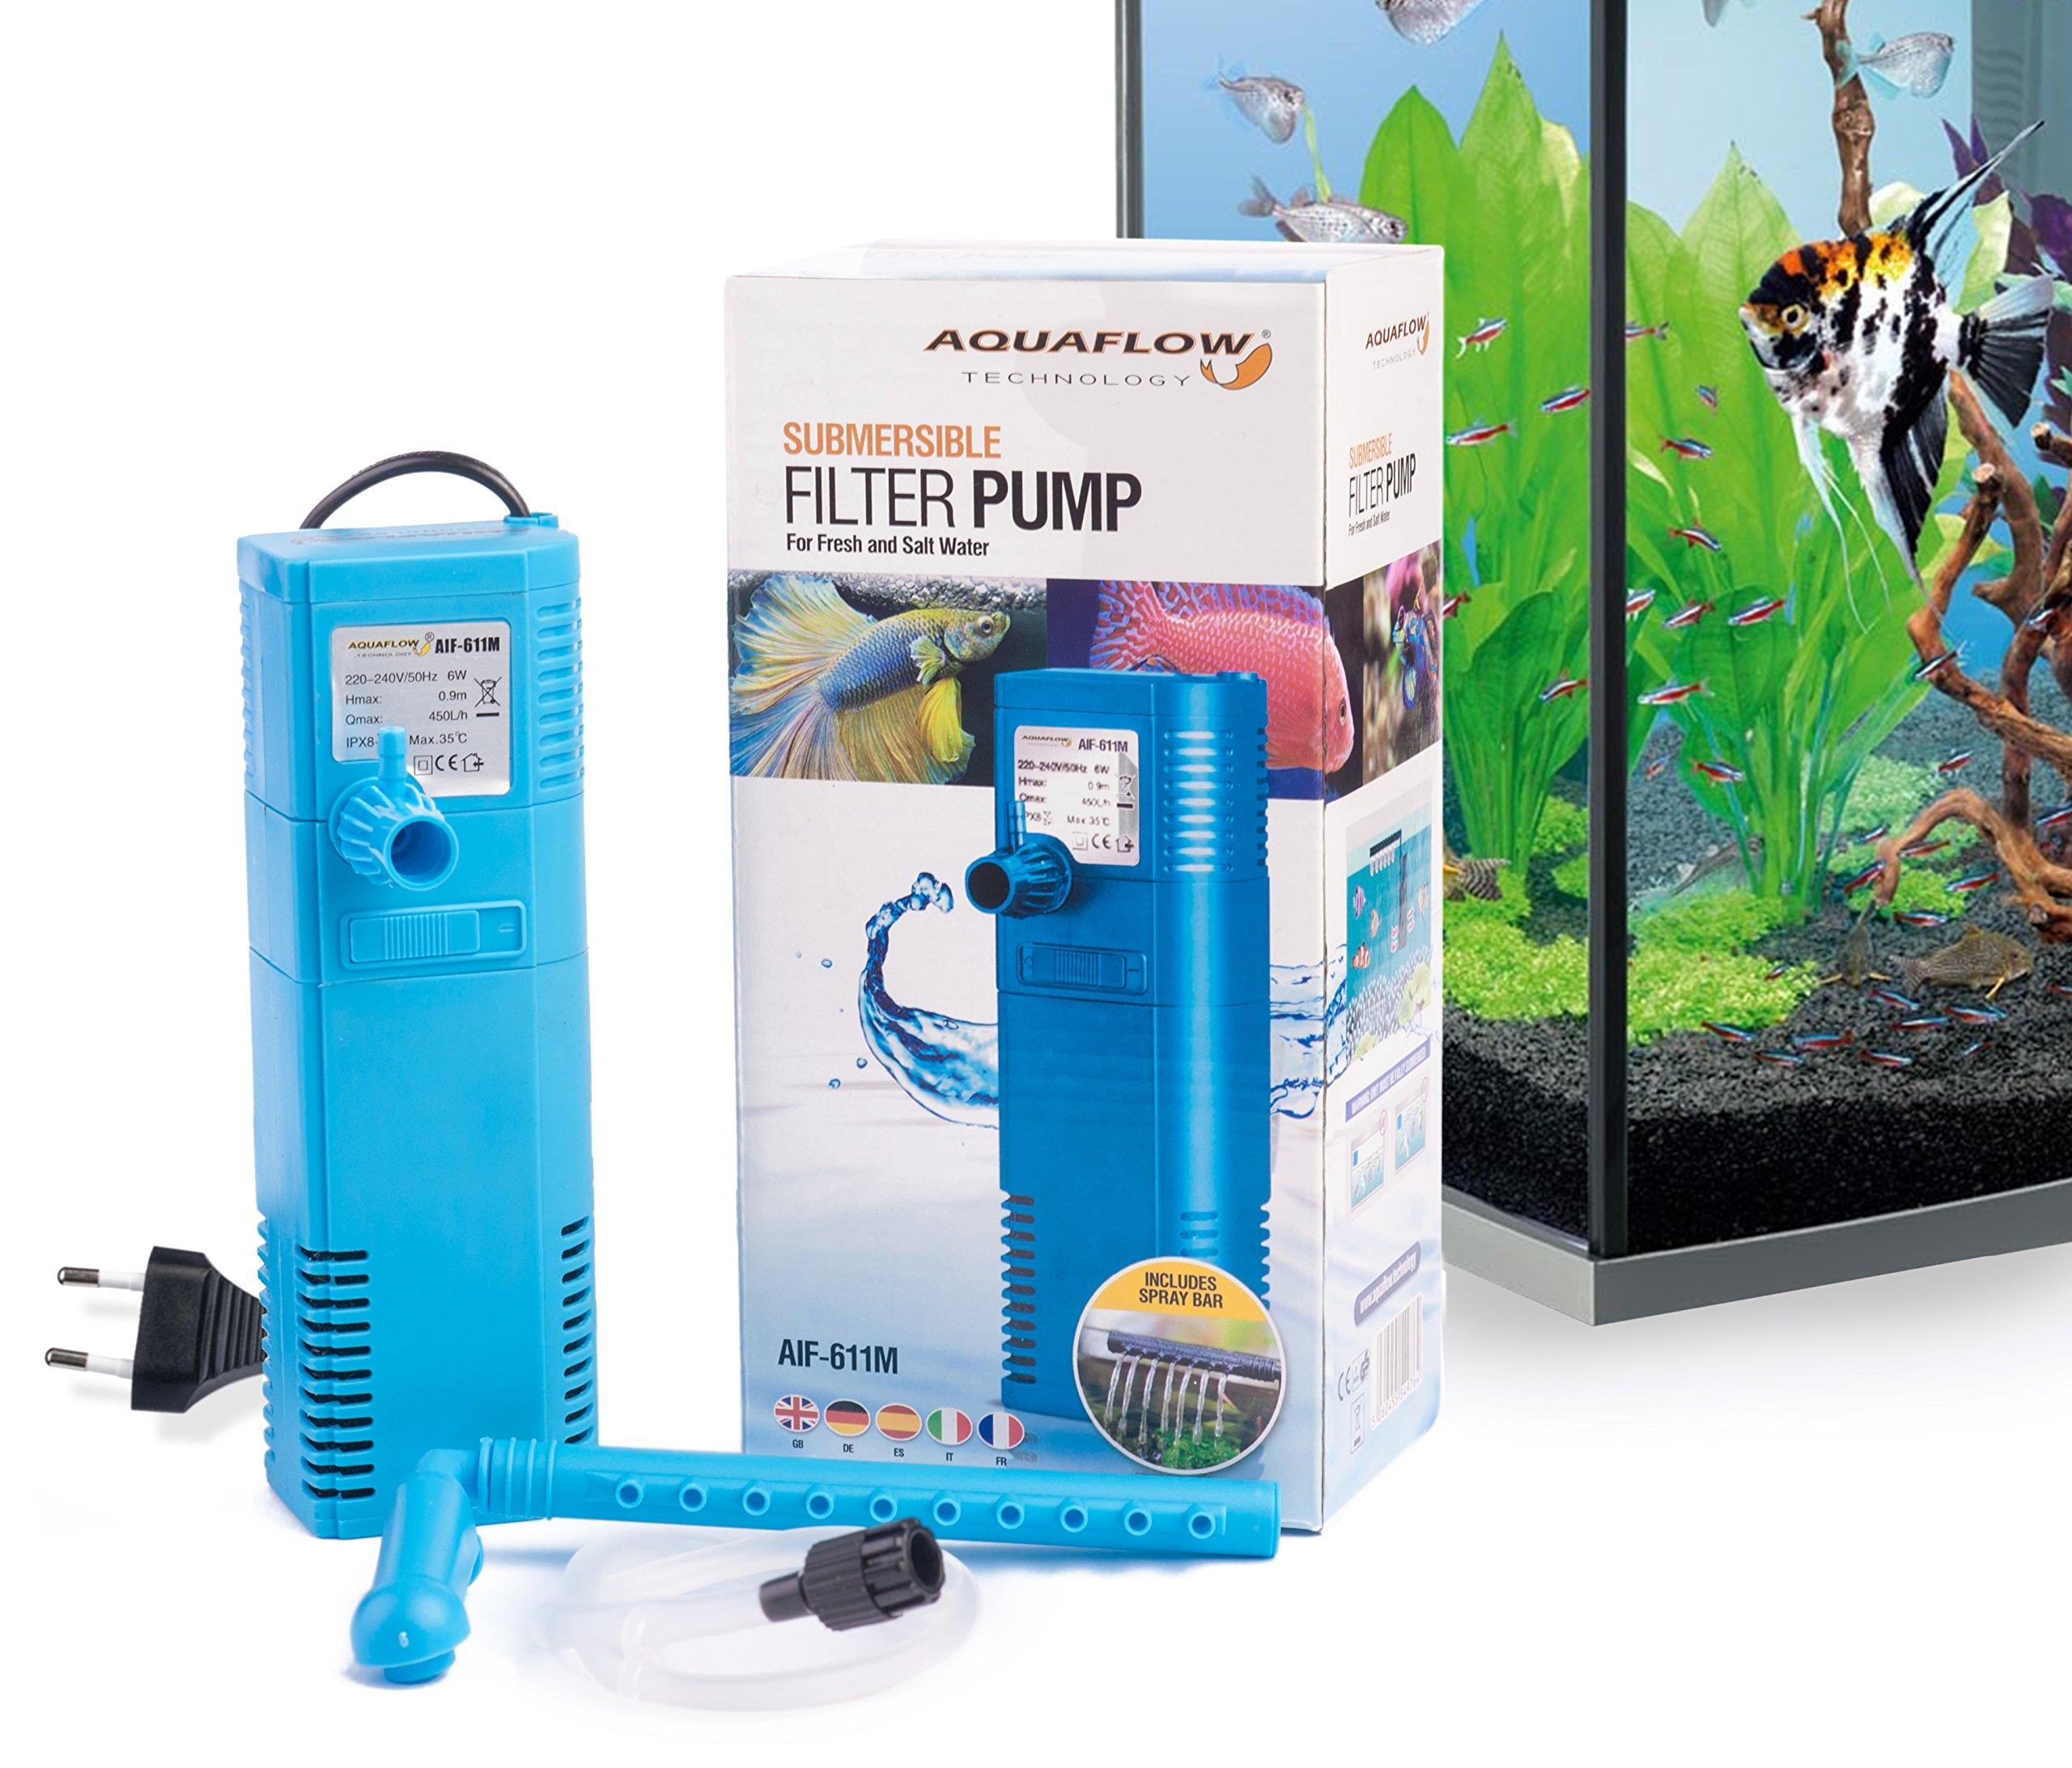 Aquaflow Technology AIF underwater aquarium filter pump for fresh